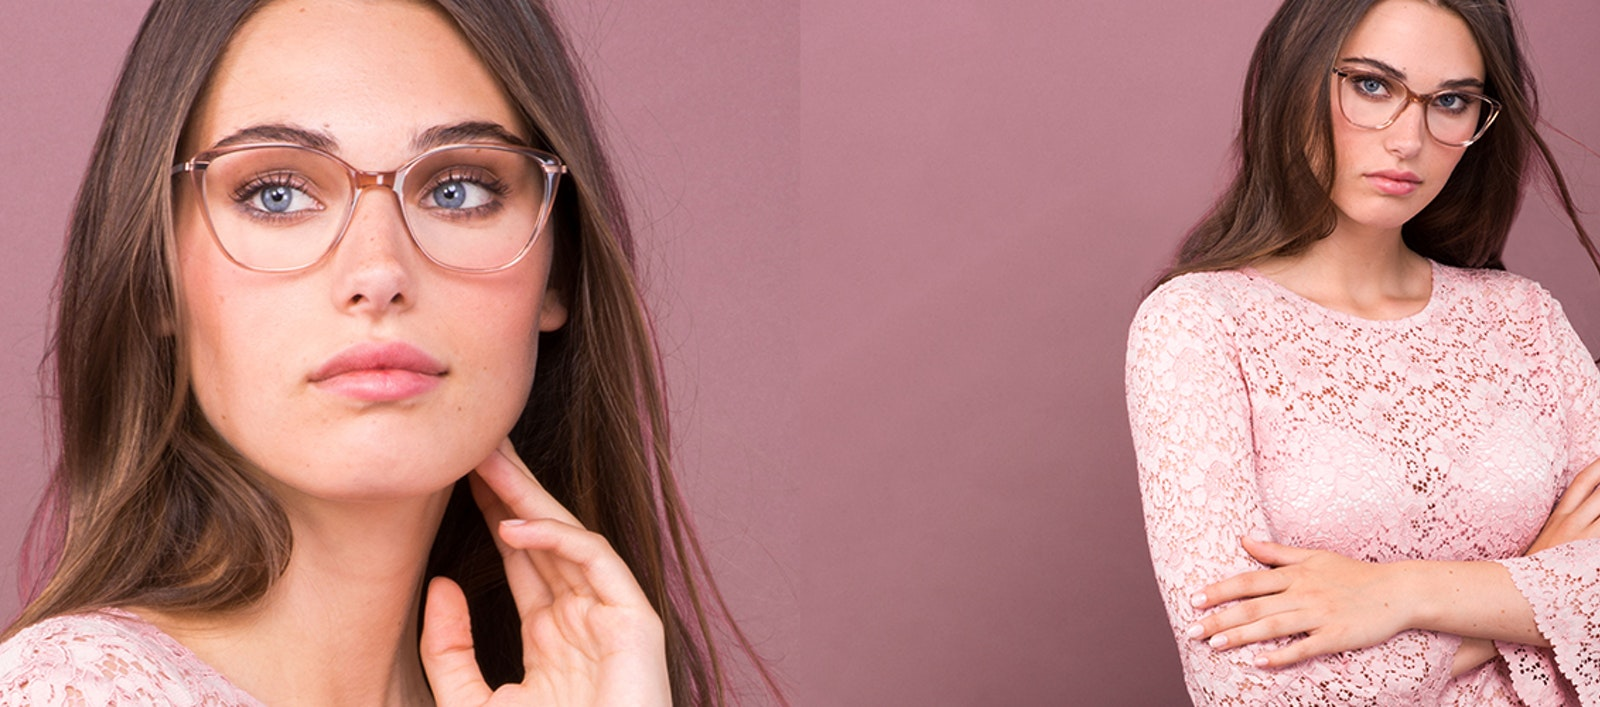 Affordable Fashion Glasses Rectangle Square Eyeglasses Women Illusion Rose